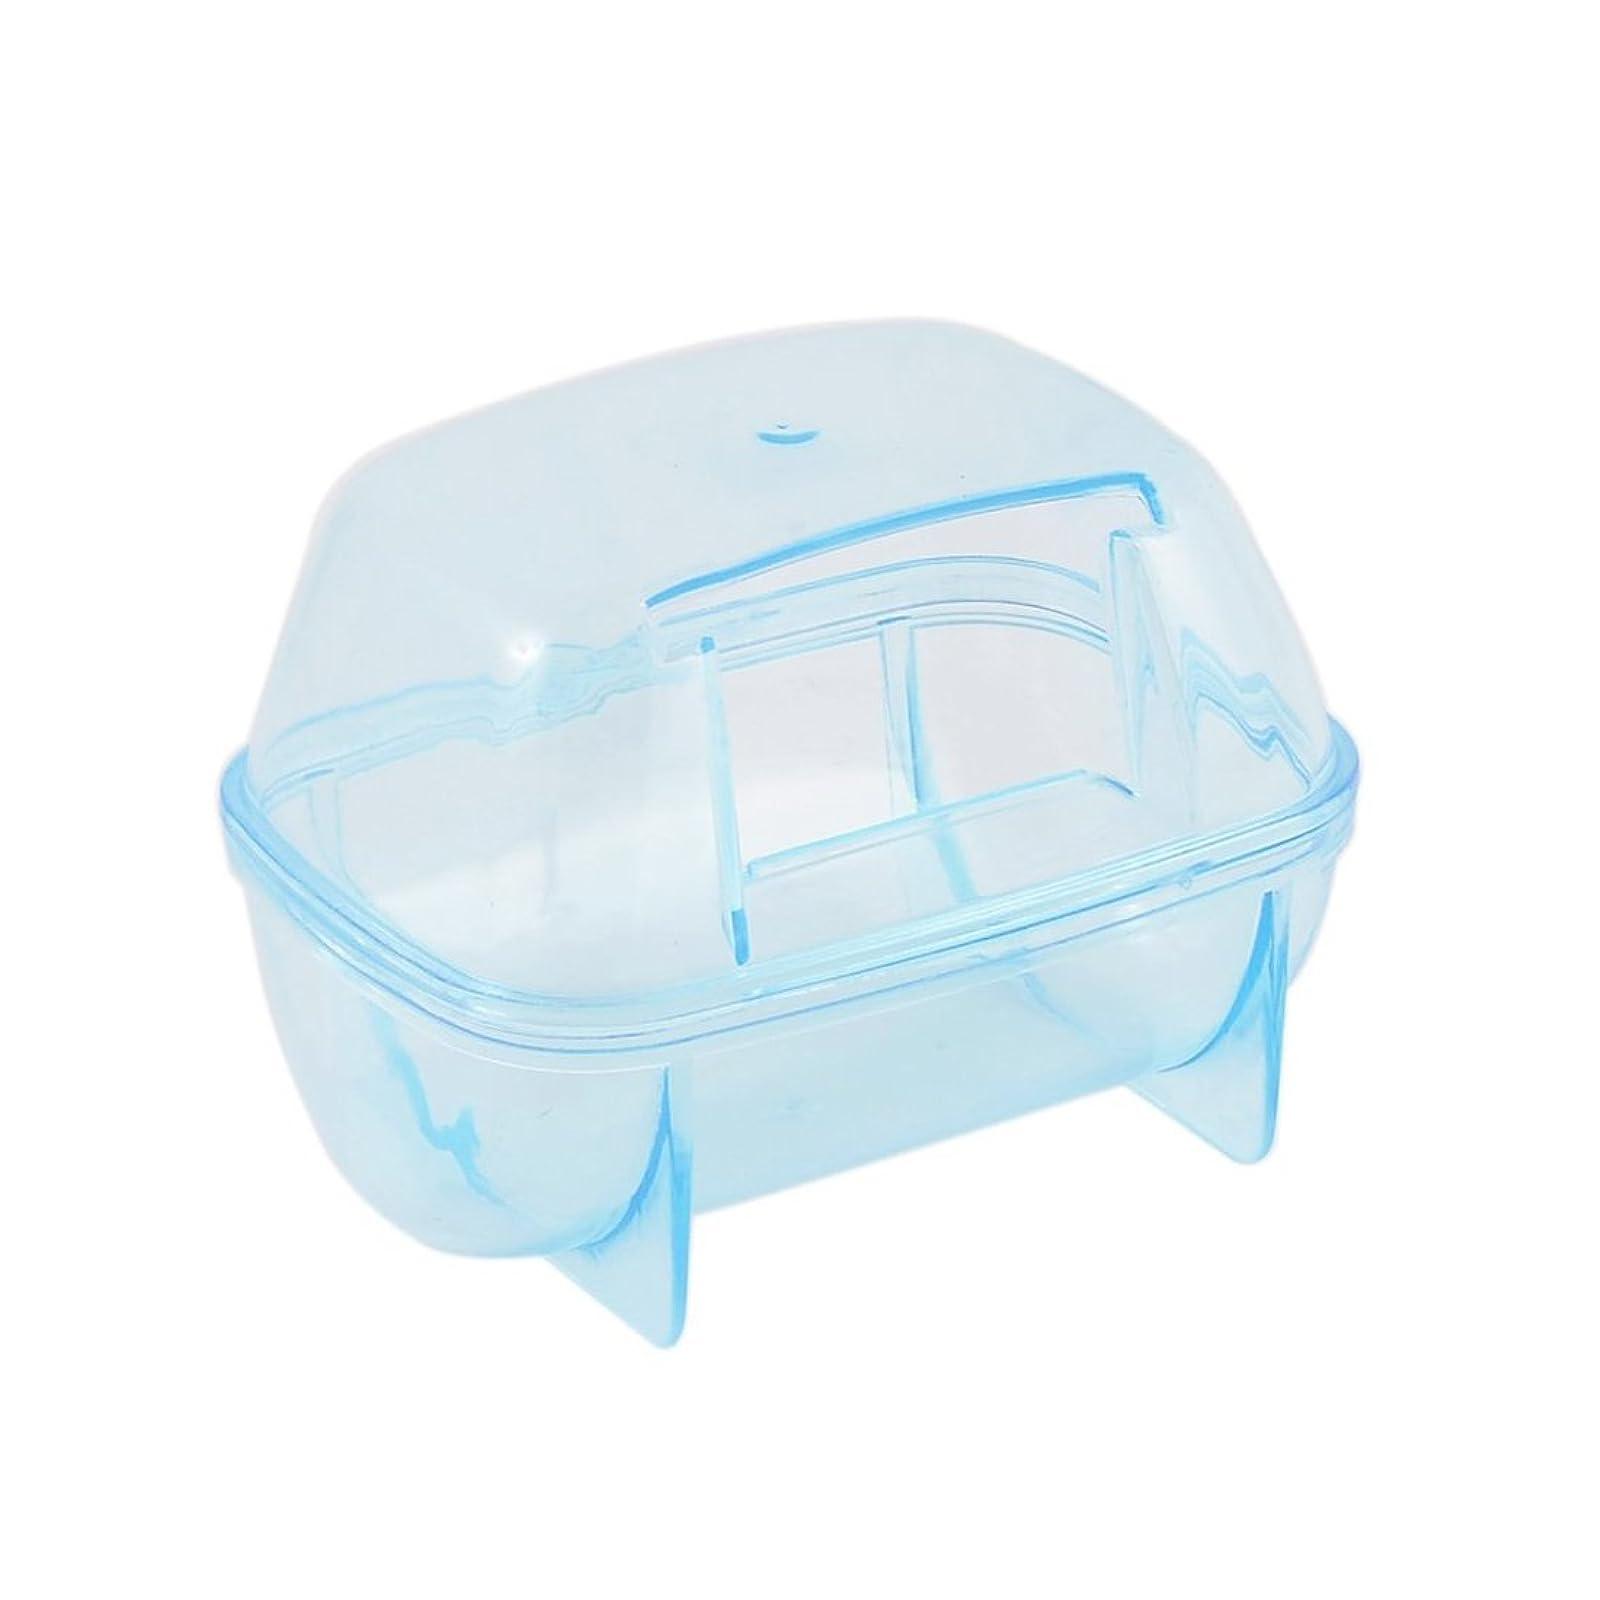 Saim Hamster Bathroom Small Pets Hamster Bathroom B0000010837 - 2